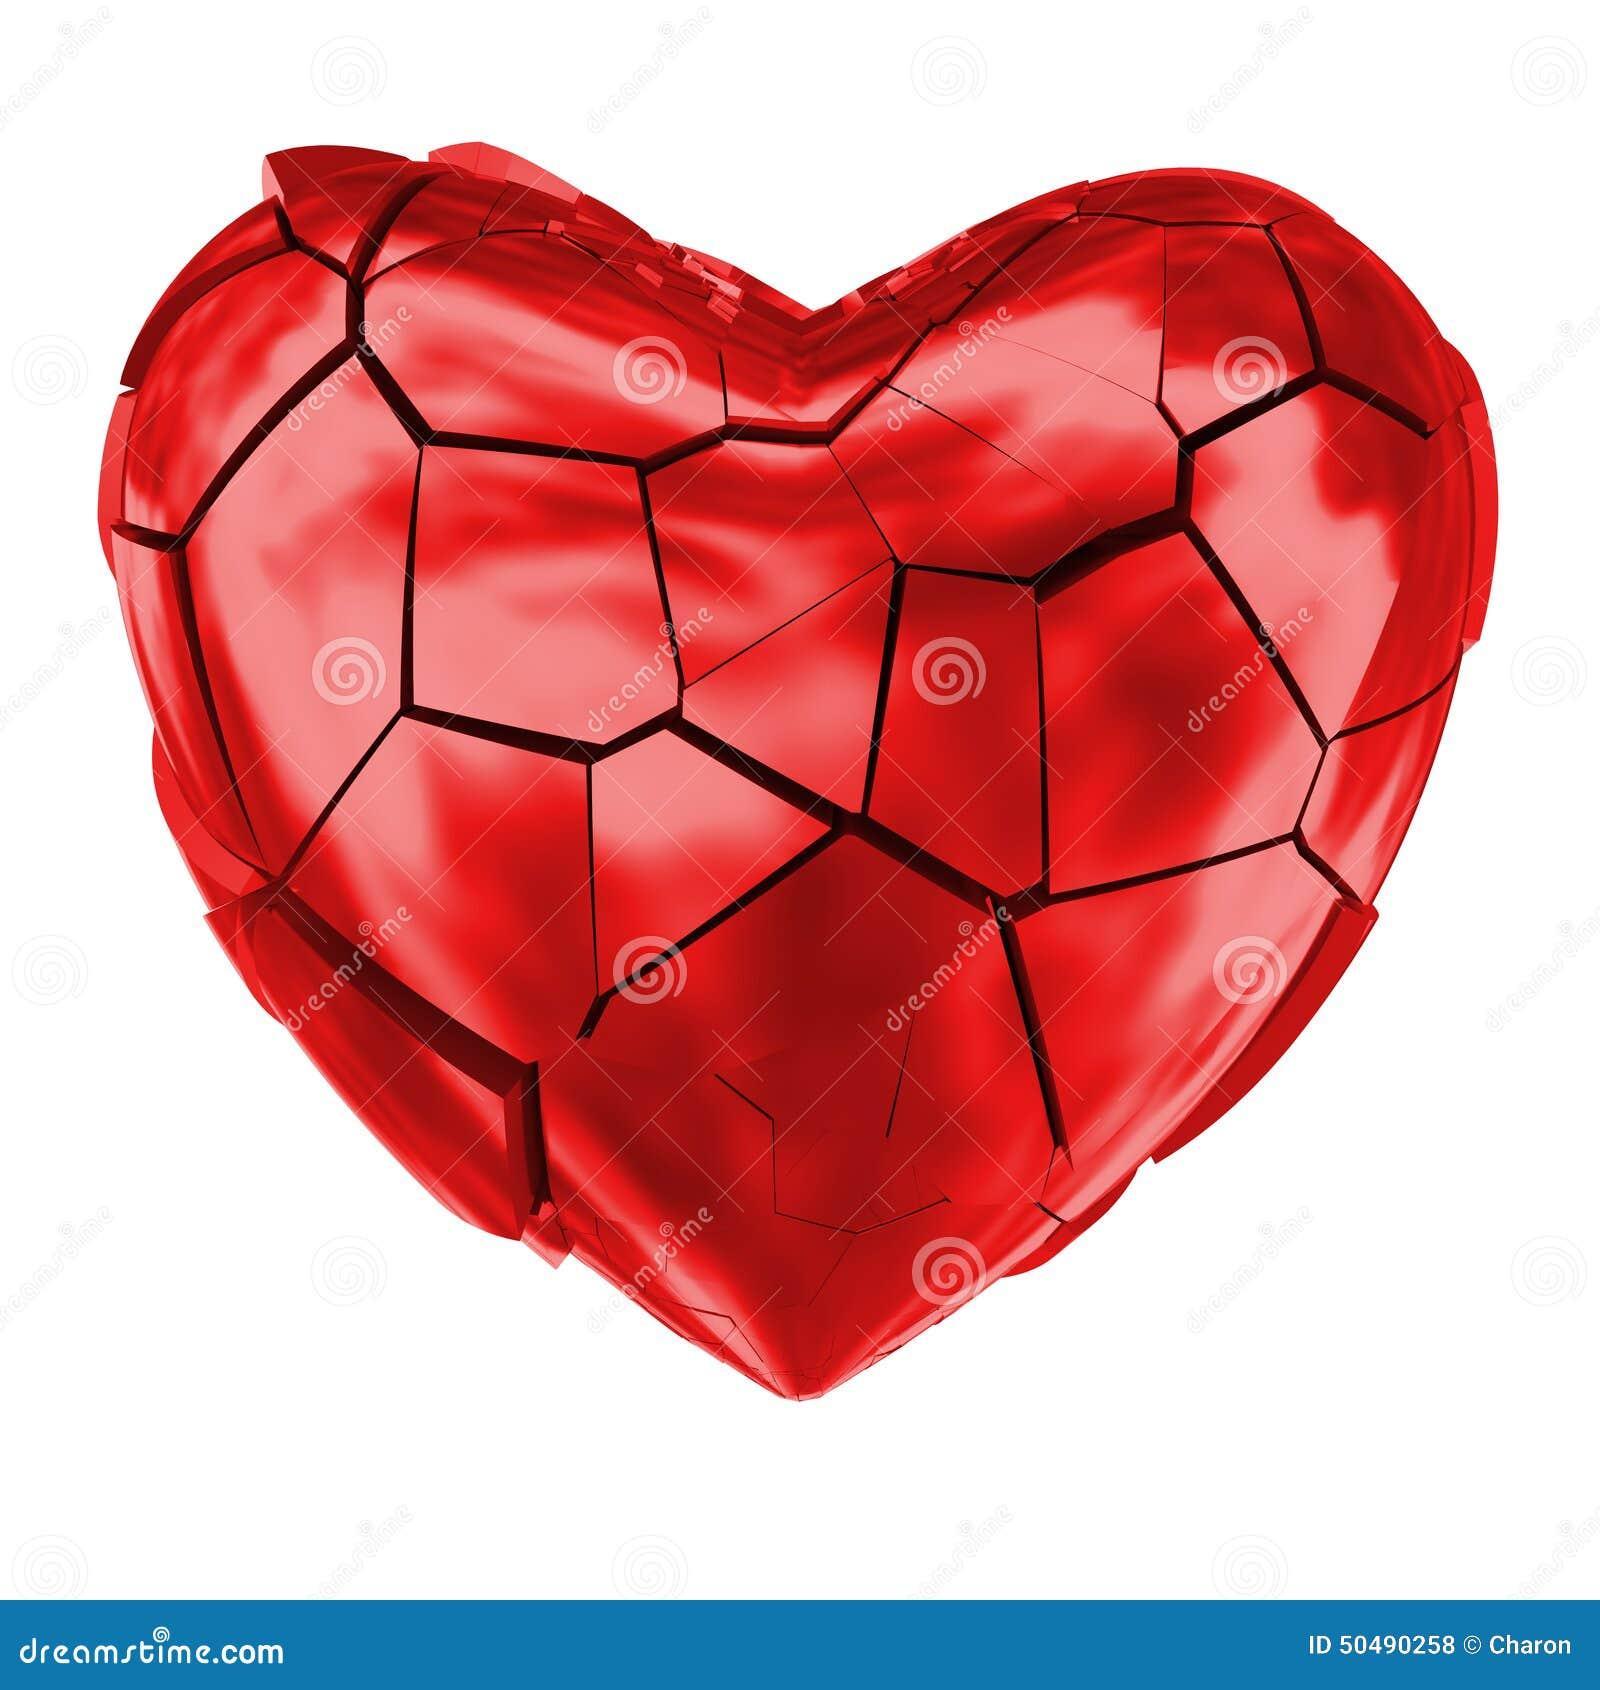 Broken heartheart splitting and breaking apart love symbol stock broken heart glossy red symbol royalty free stock photos biocorpaavc Images